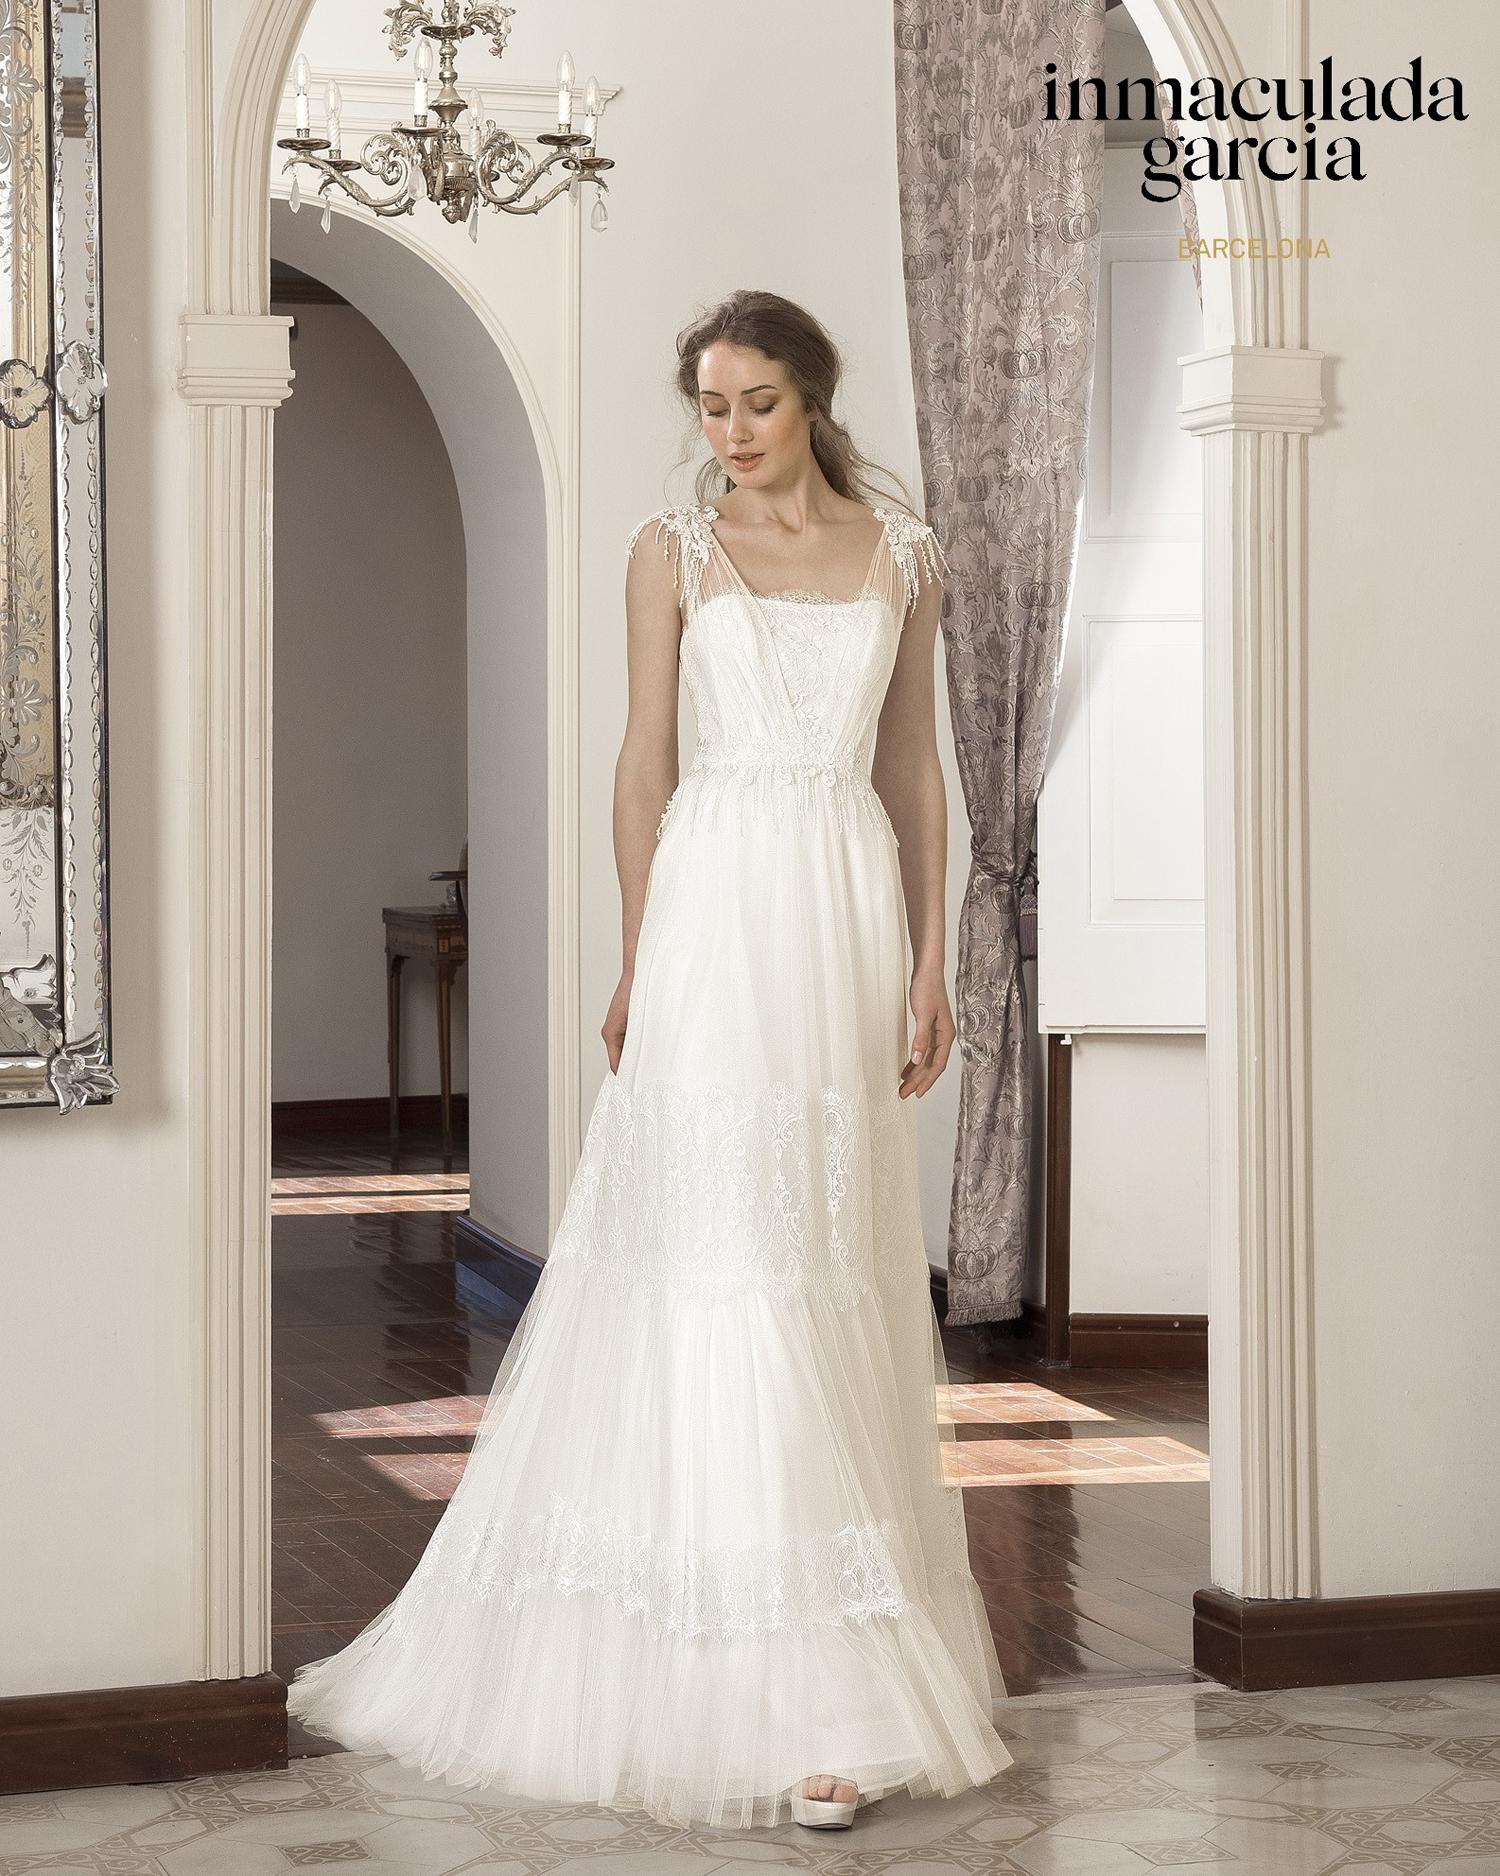 Vestiti Eleganti Vicenza.Abito Da Sposa Immaculada Garcia 2020 Honey Mariages It